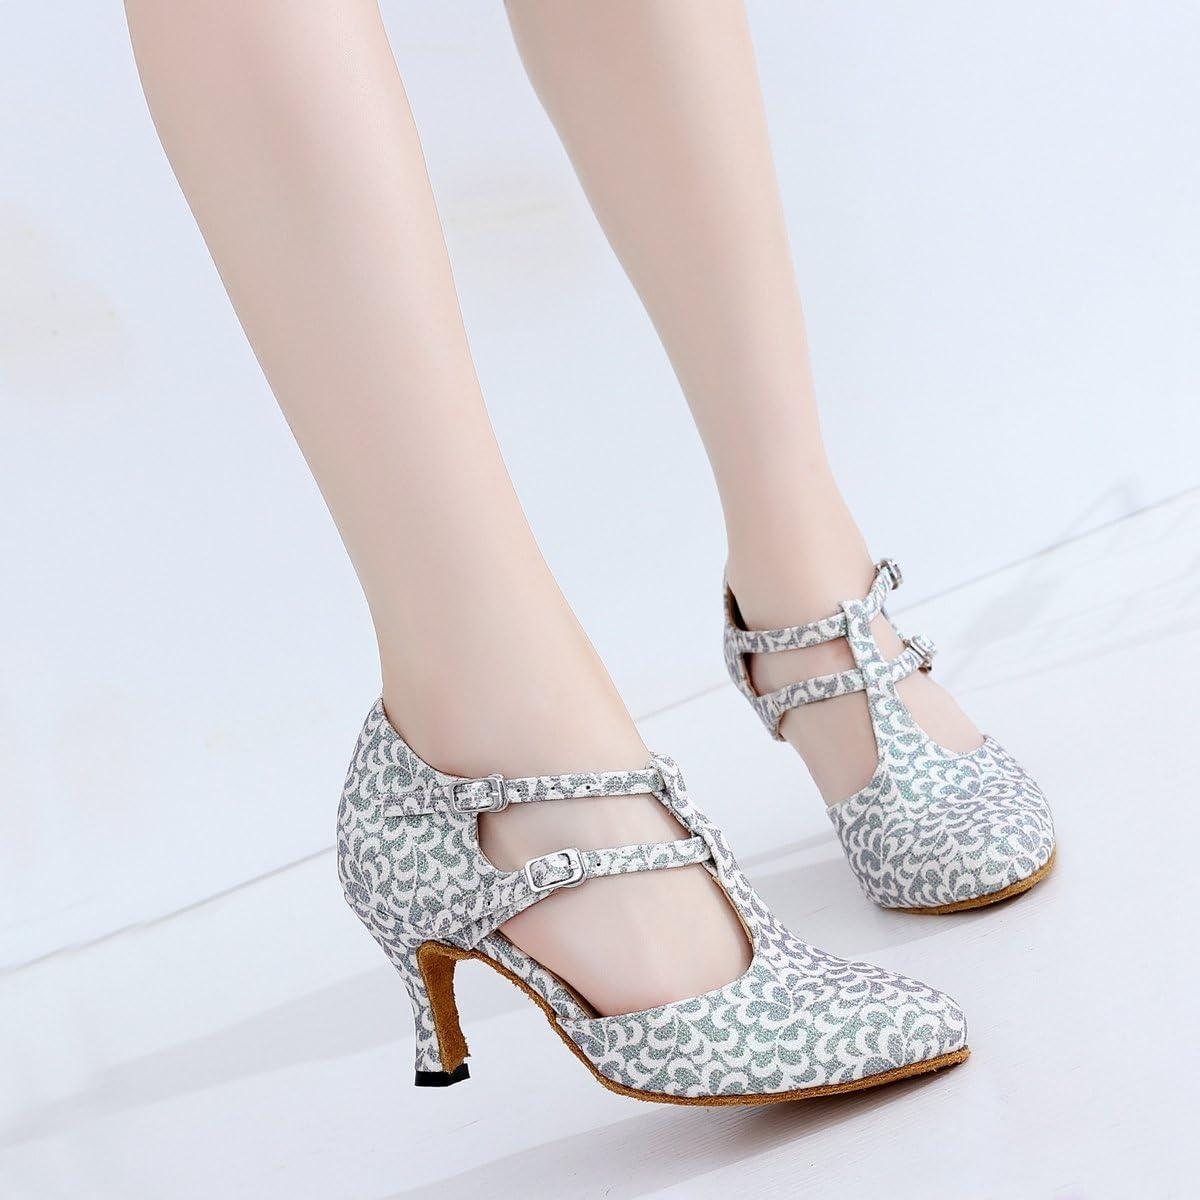 Minishion Womens T-Strap Closed Toe Floral Glitter Latin Ballroom Salsa Dancing Shoes Wedding Evening Prom Pumps